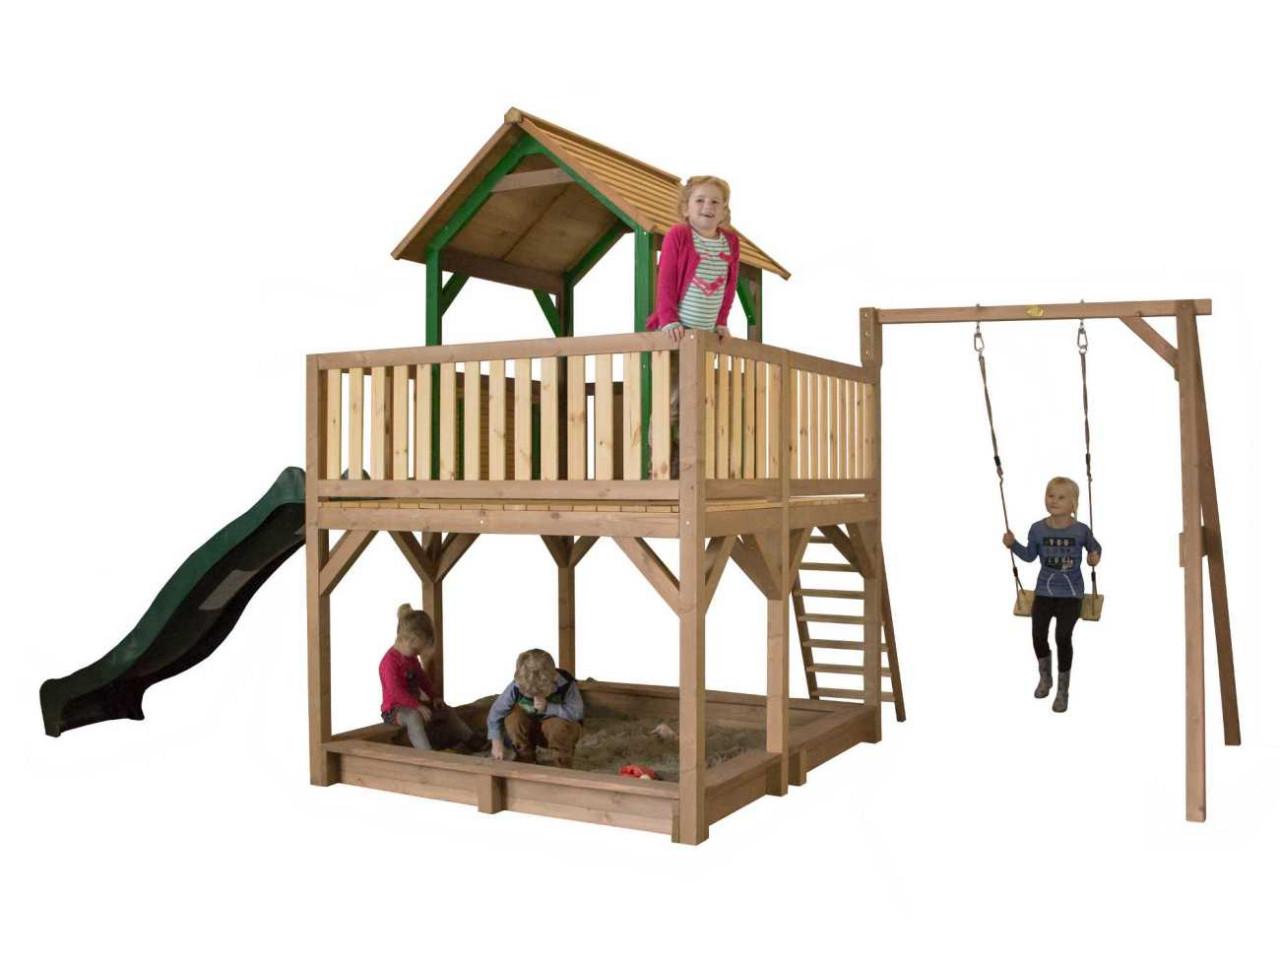 Spielturm Atka mit 1-Schaukel, Axi Spielturm, Kinder